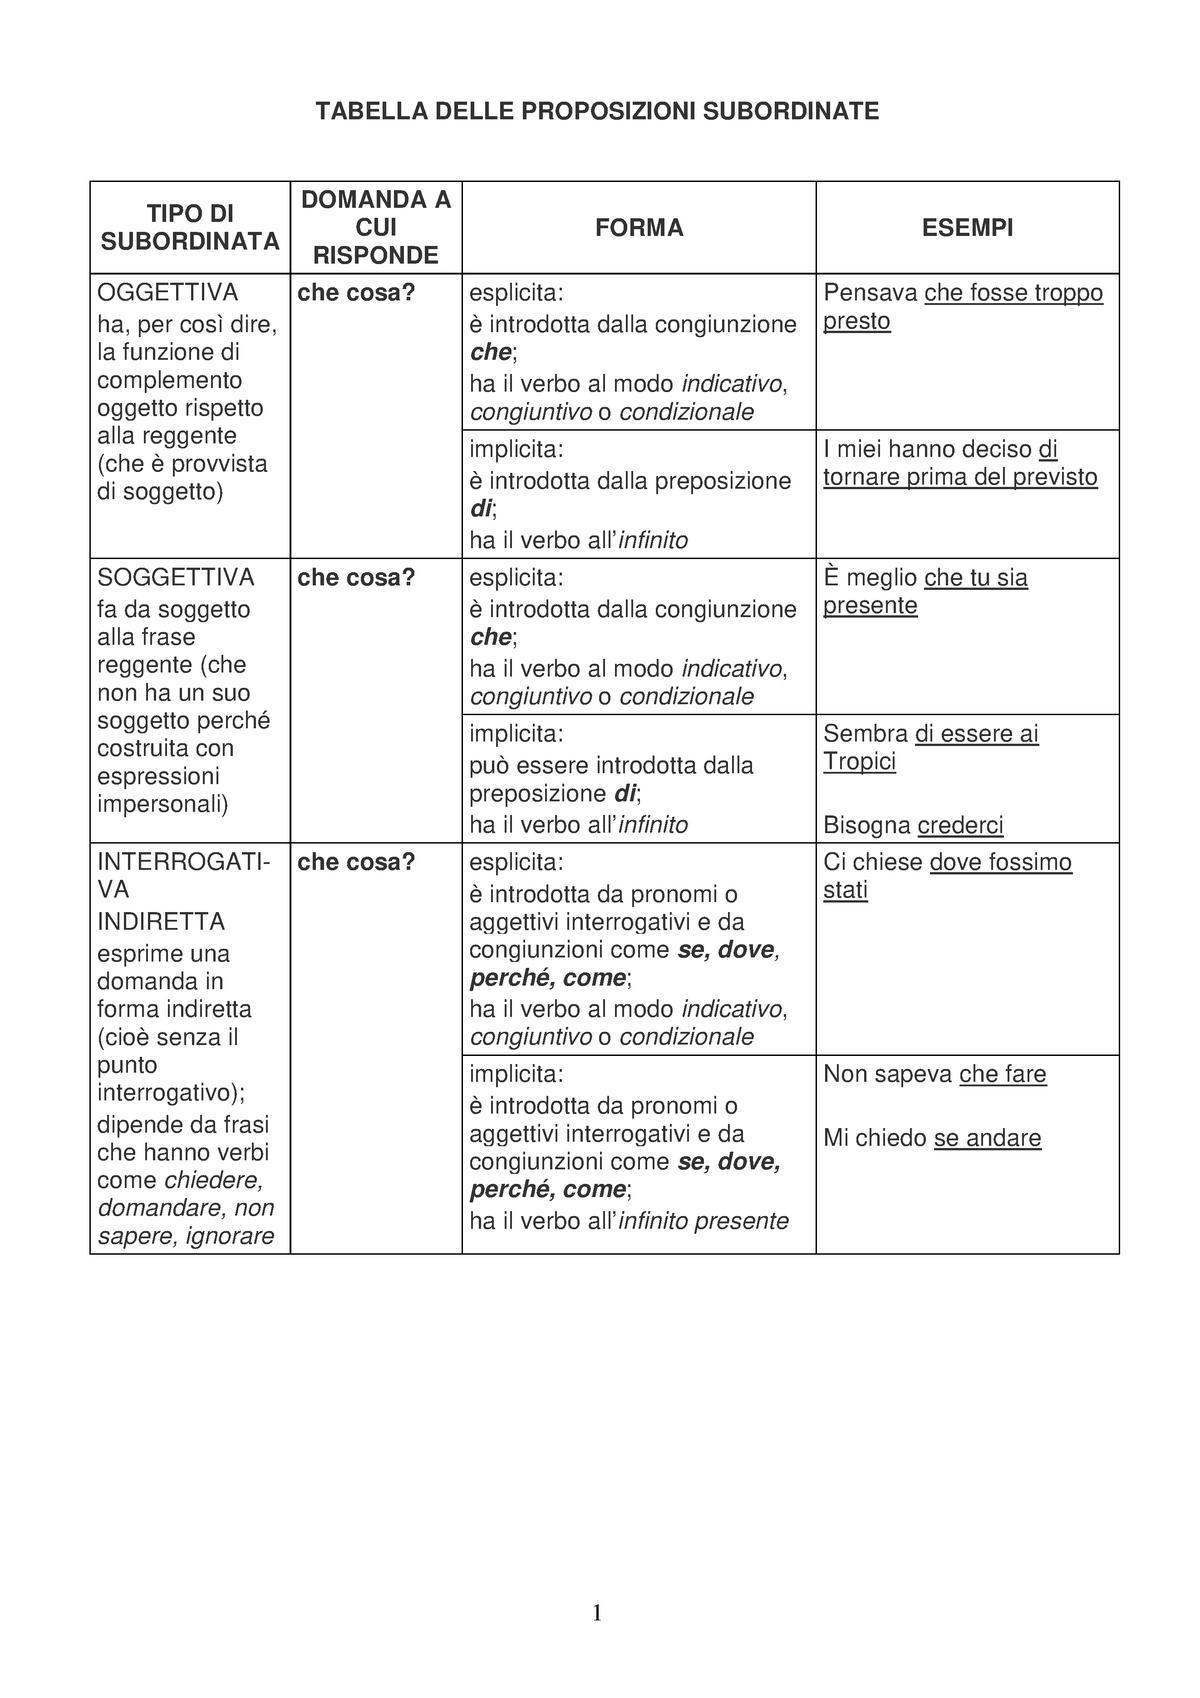 Tabella subordinate dsa - - UNIVPM - StuDocu